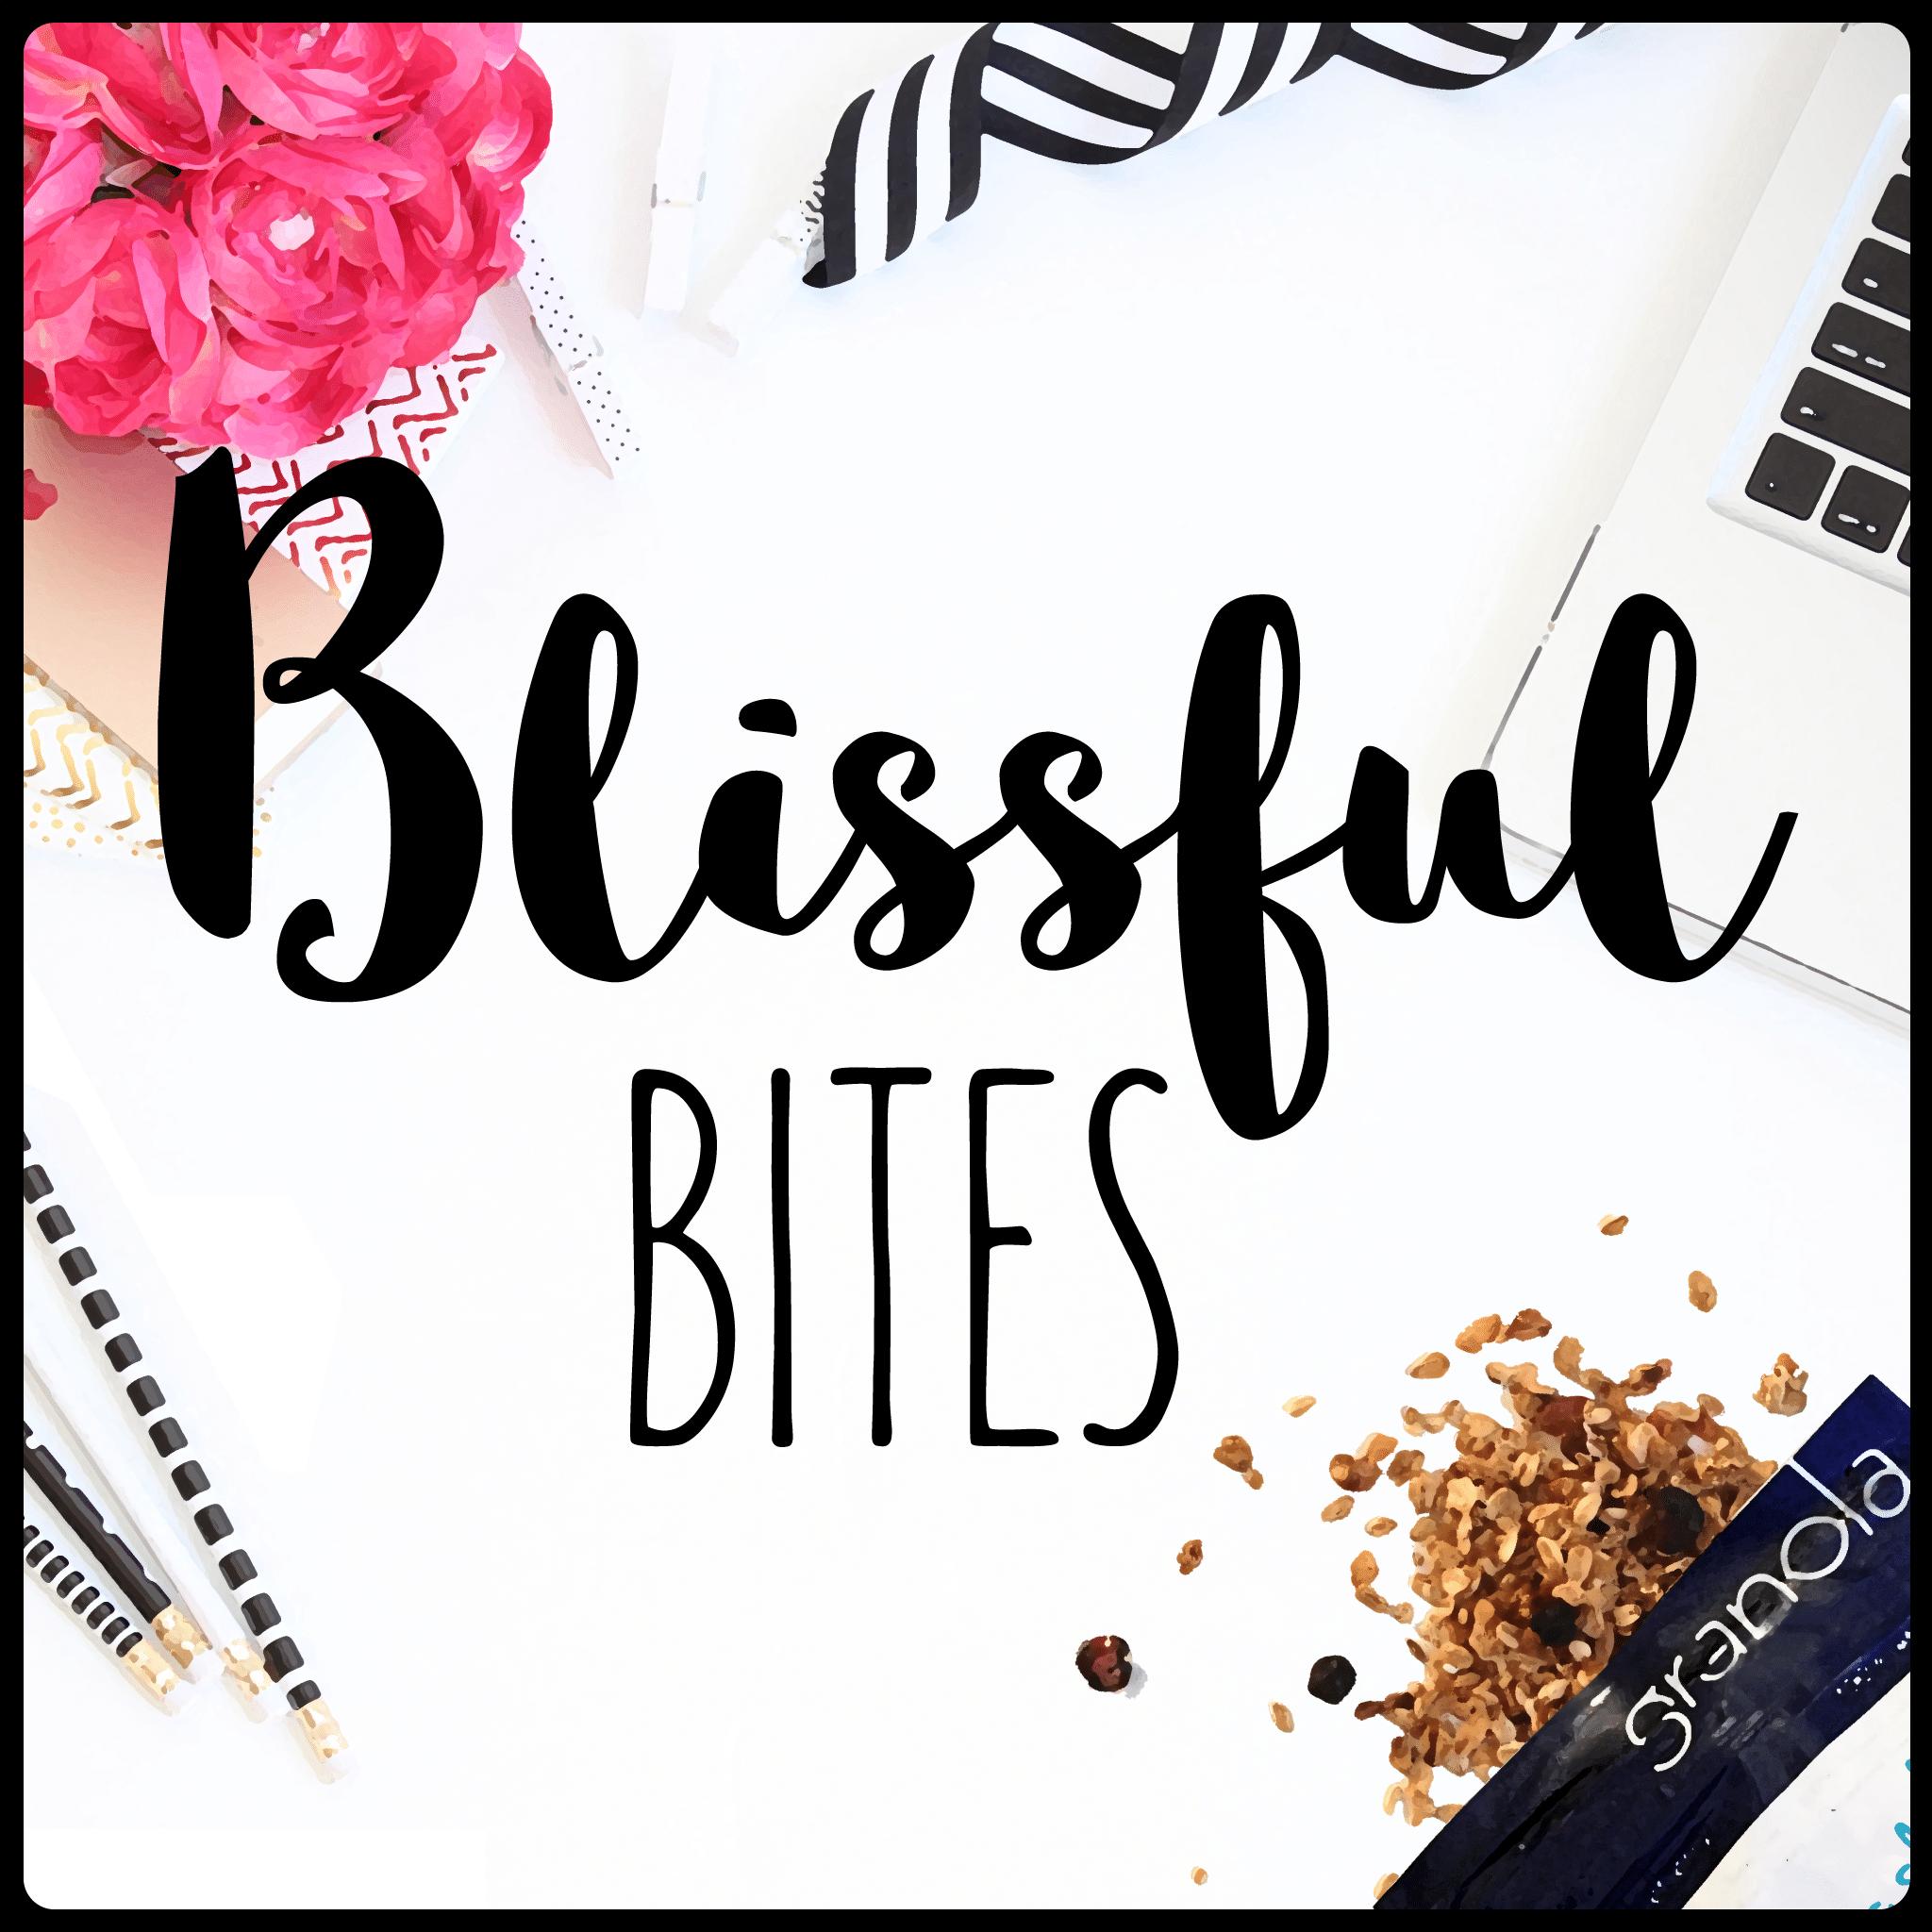 BlissfulBites